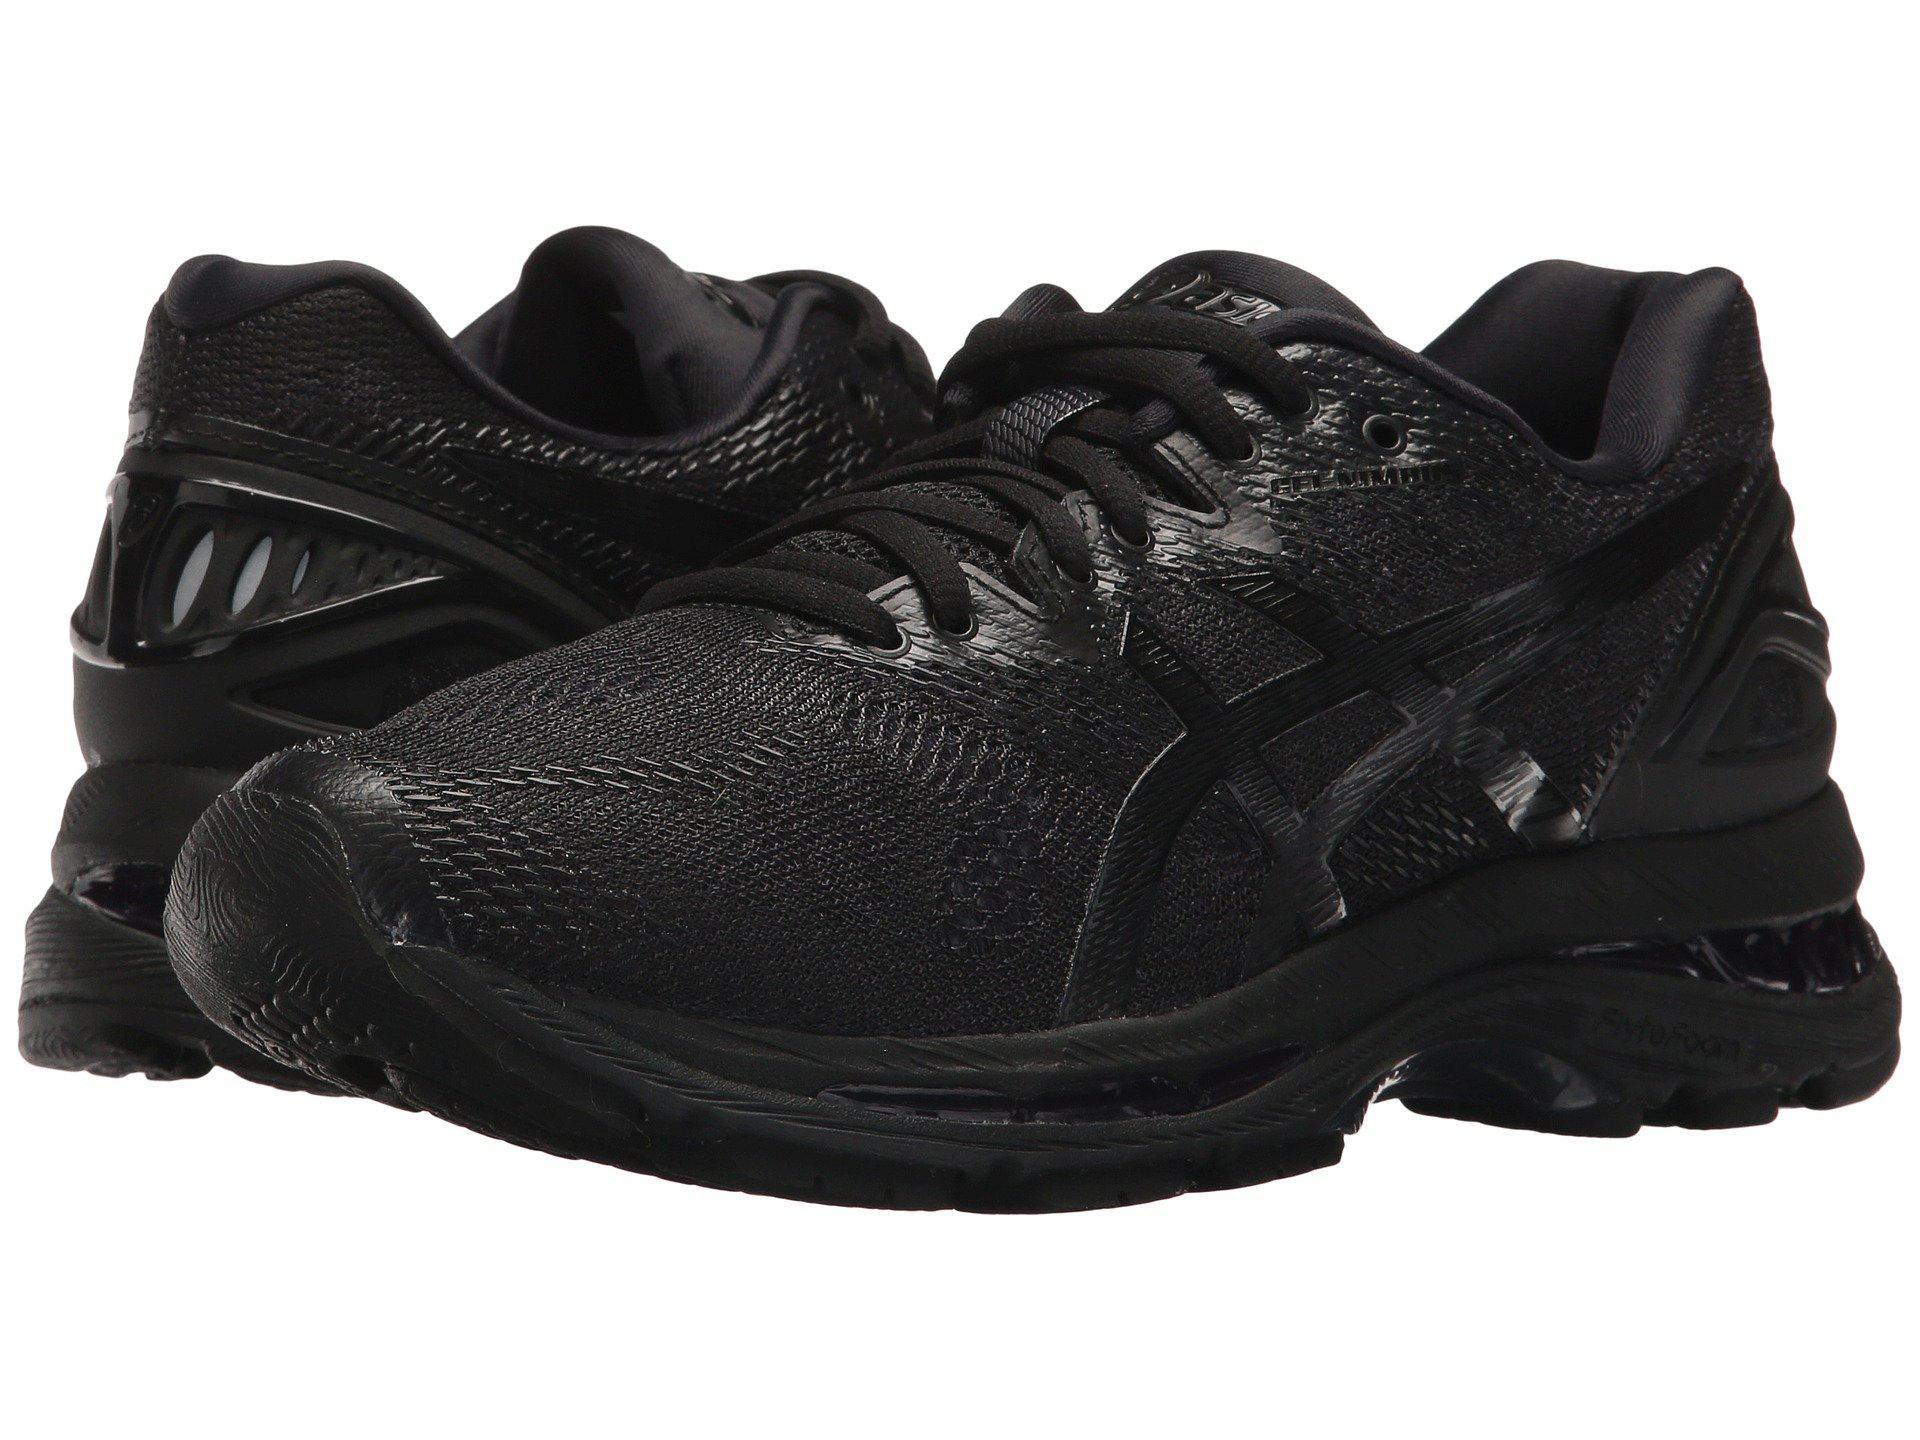 Lyst Asics/ Gel nimbus (r) 20 carbone) (noir/ blanc Lyst/ carbone) Femme Running 3ae7d5e - starwarsforcearenahackcheatonline.website